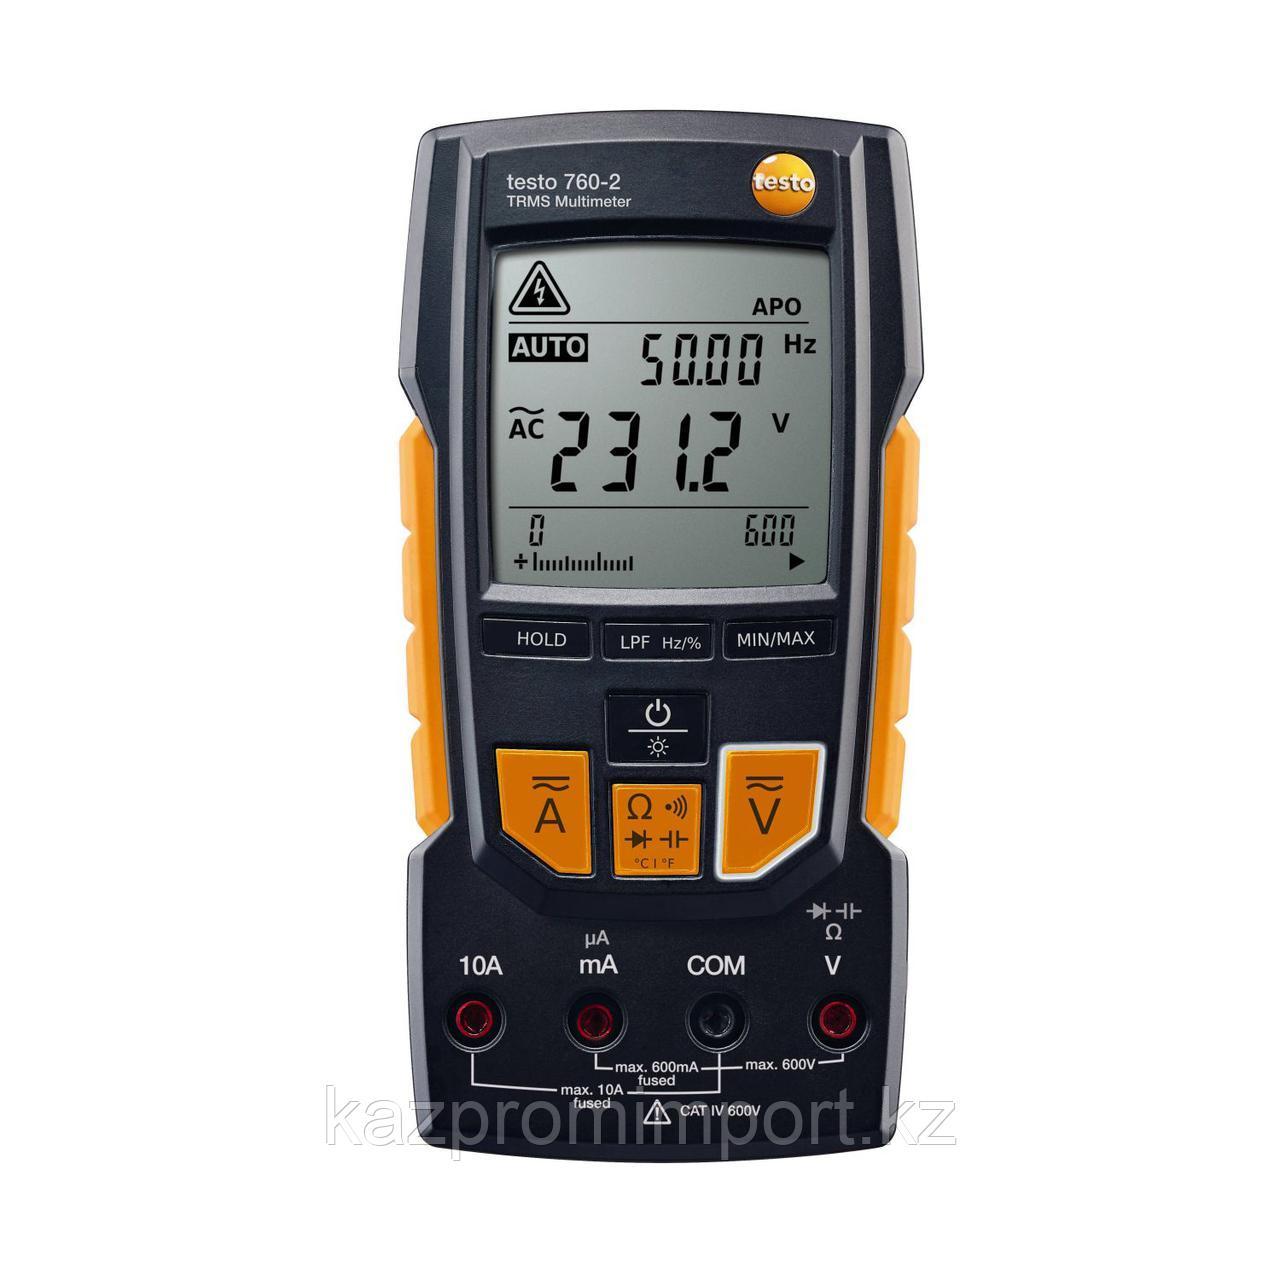 Testo 760-2 - Цифровой мультиметр